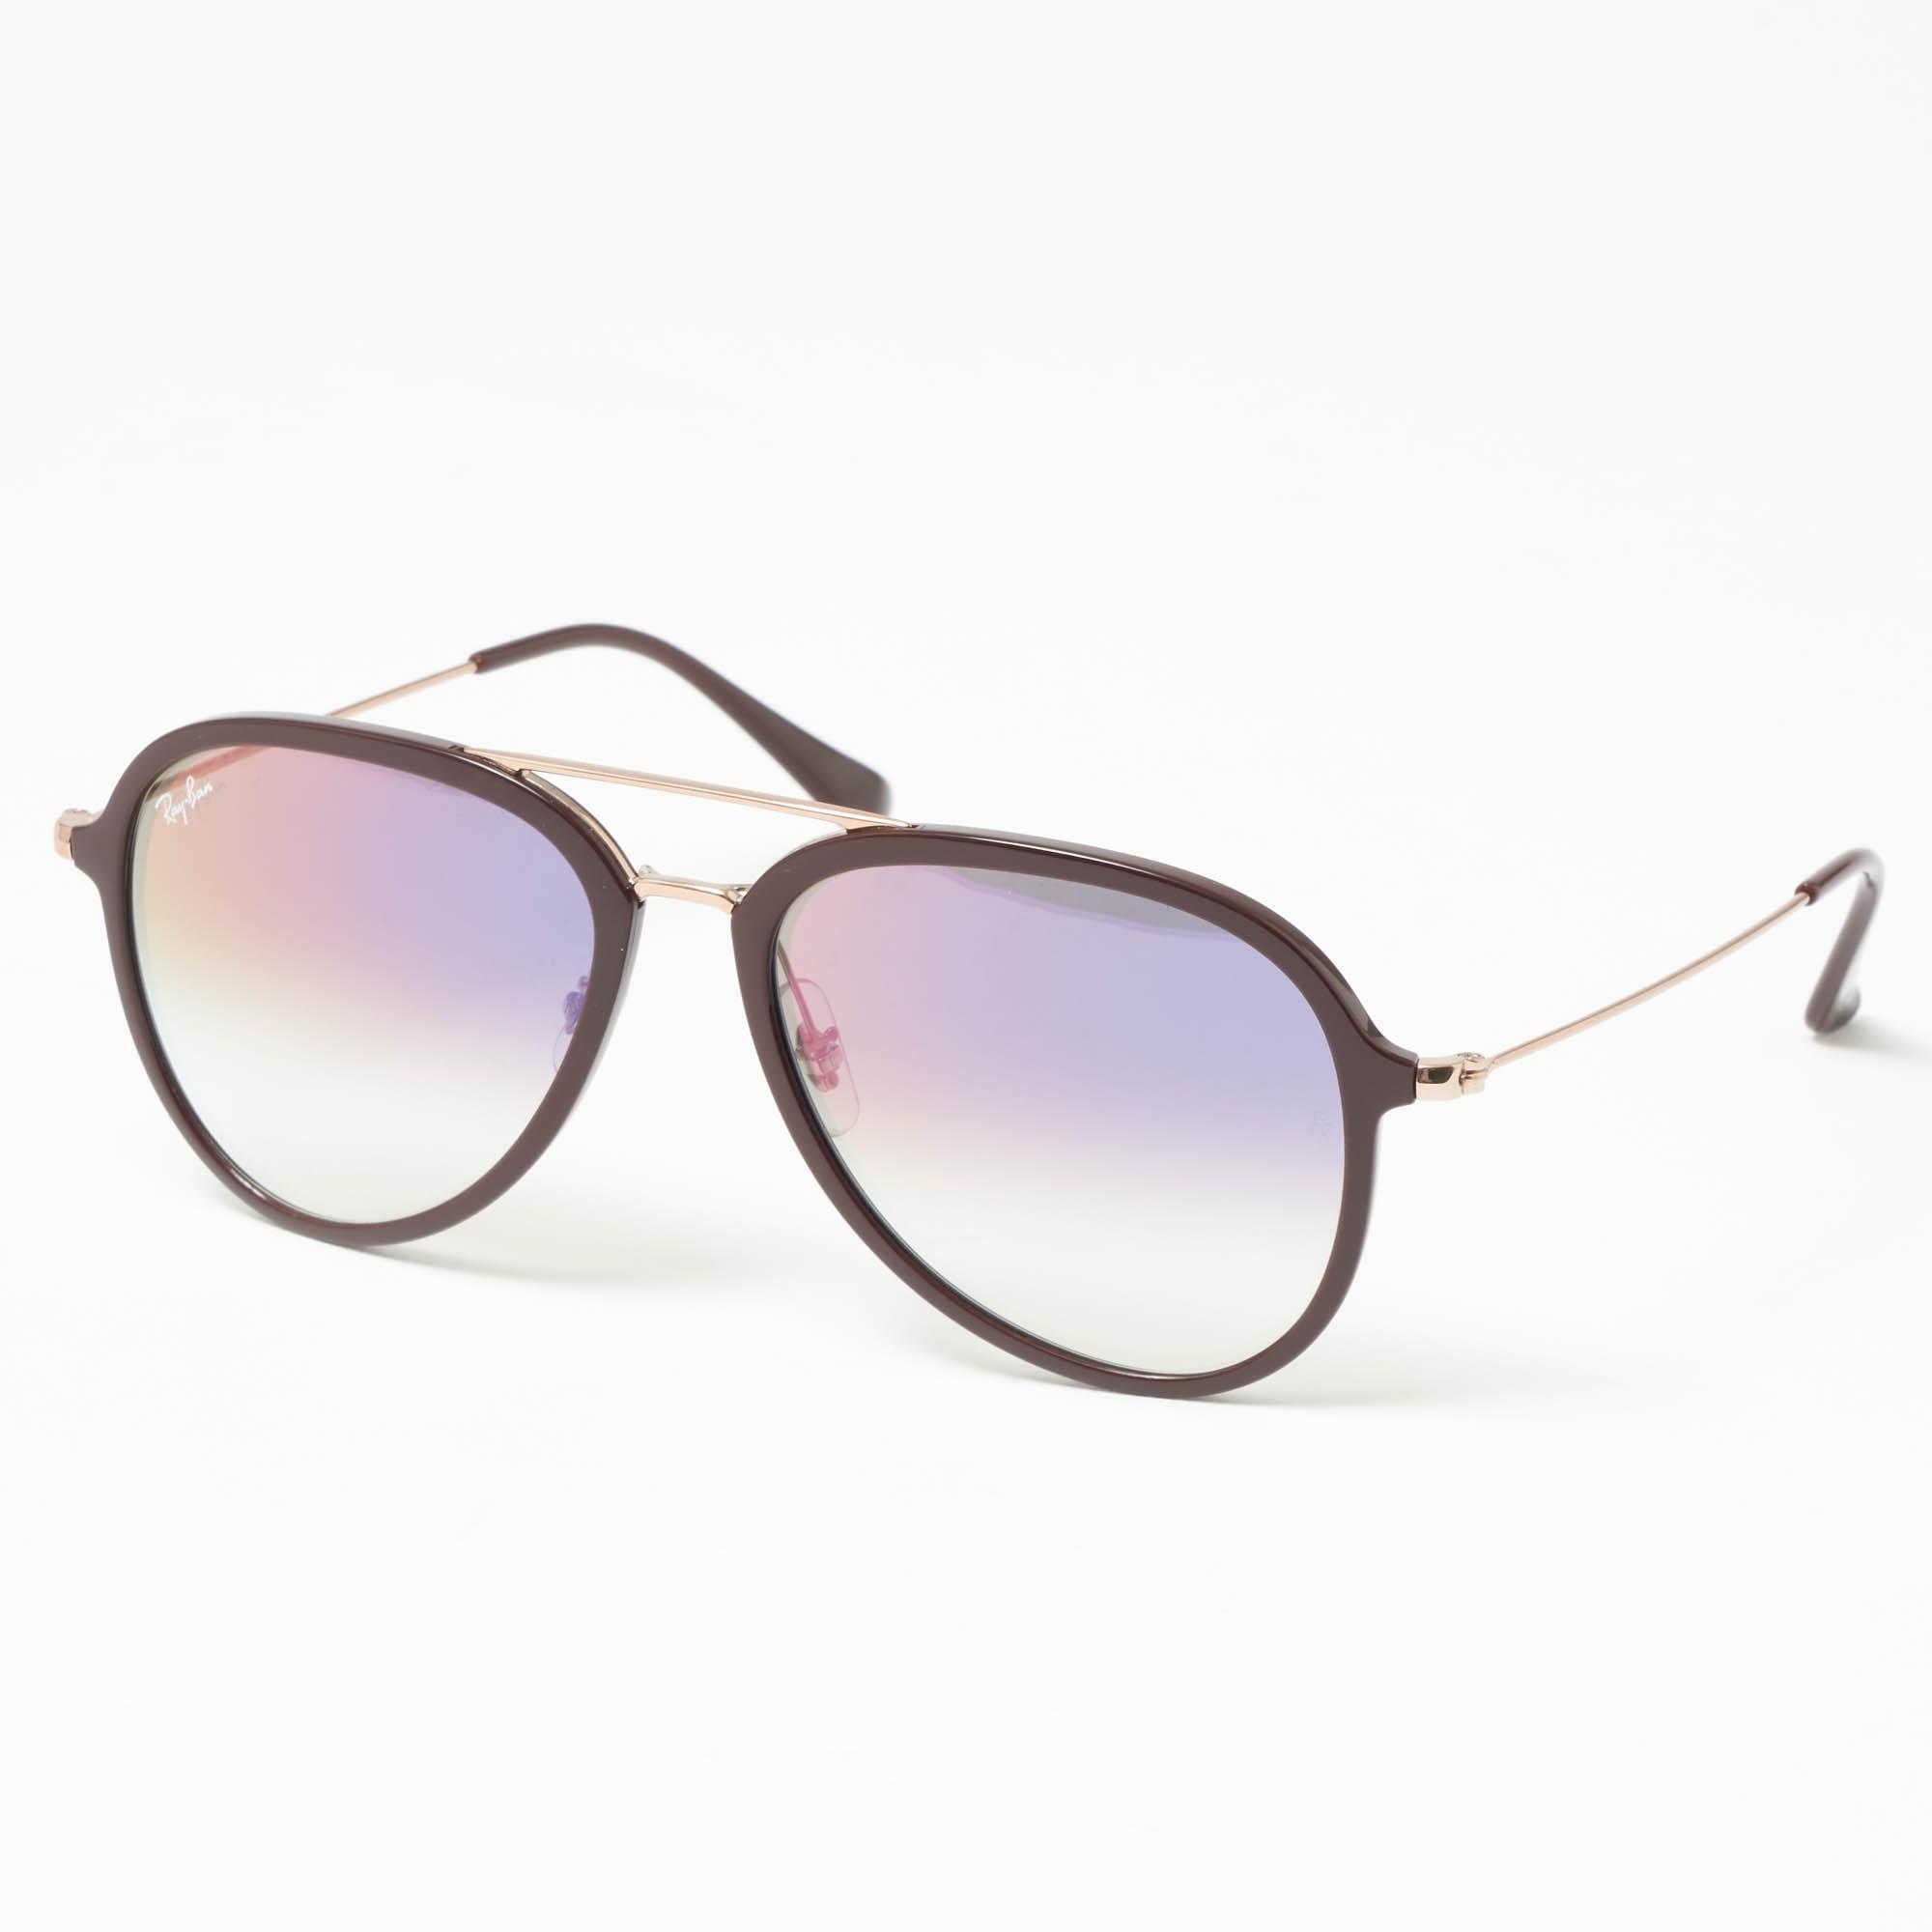 162ab5d96a Ray Ban Plum RB4298 Sunglasses Gradient Lenses